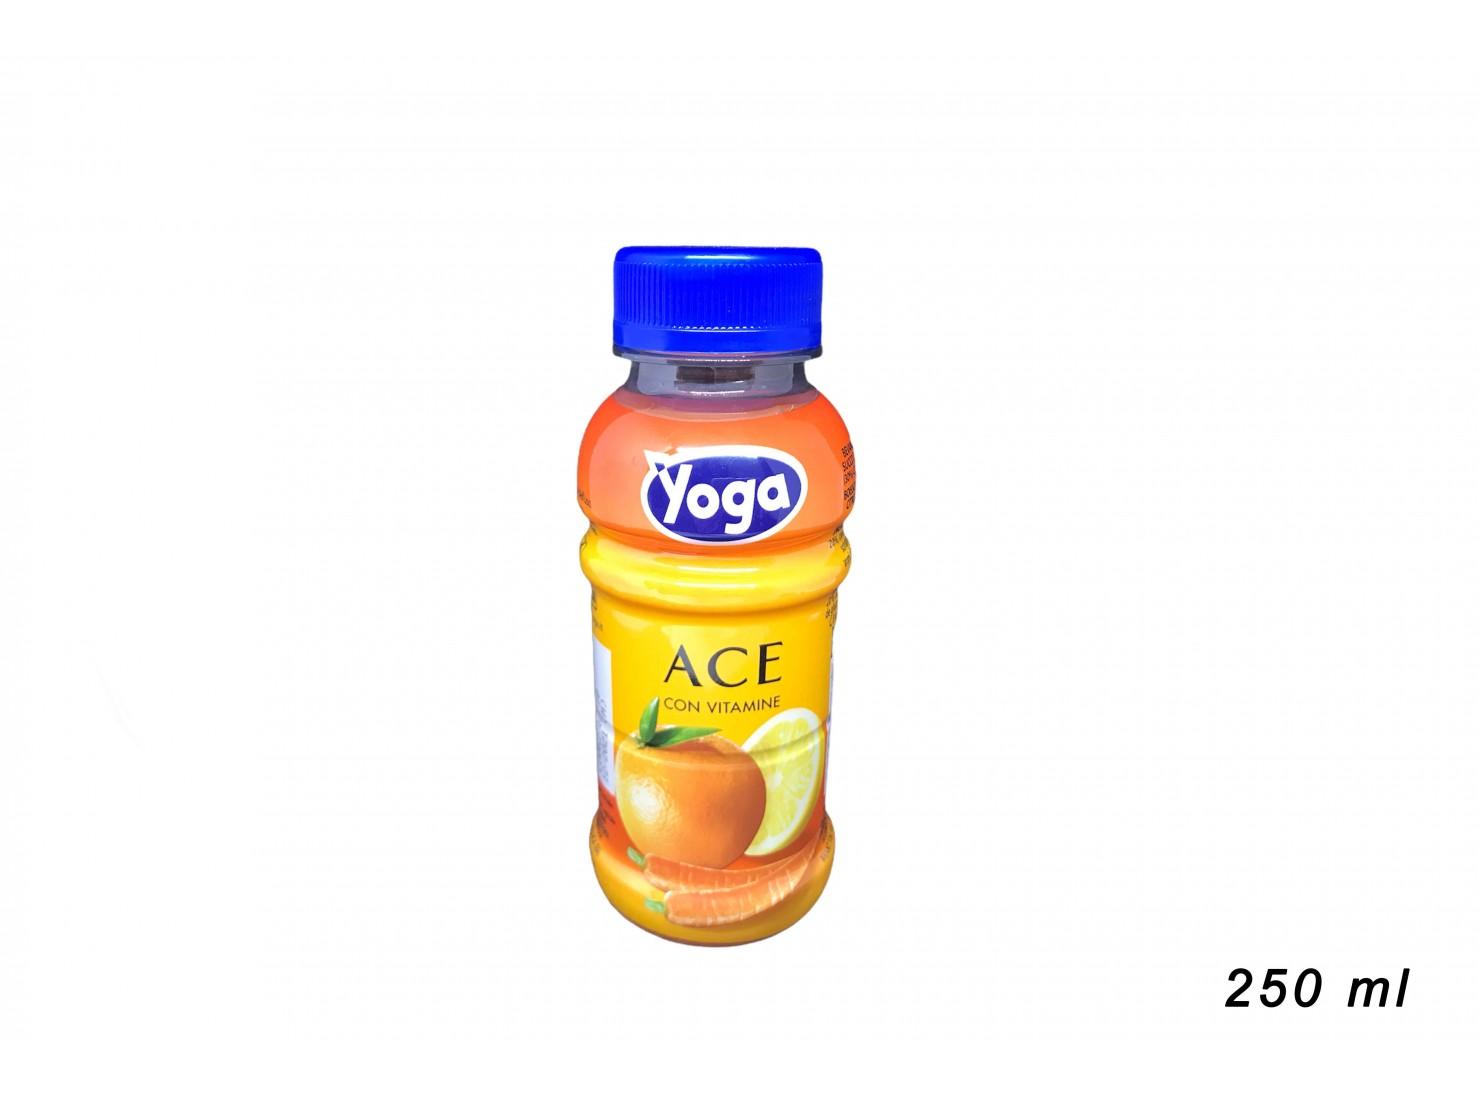 YOGA SUCCO ACE 250 ML